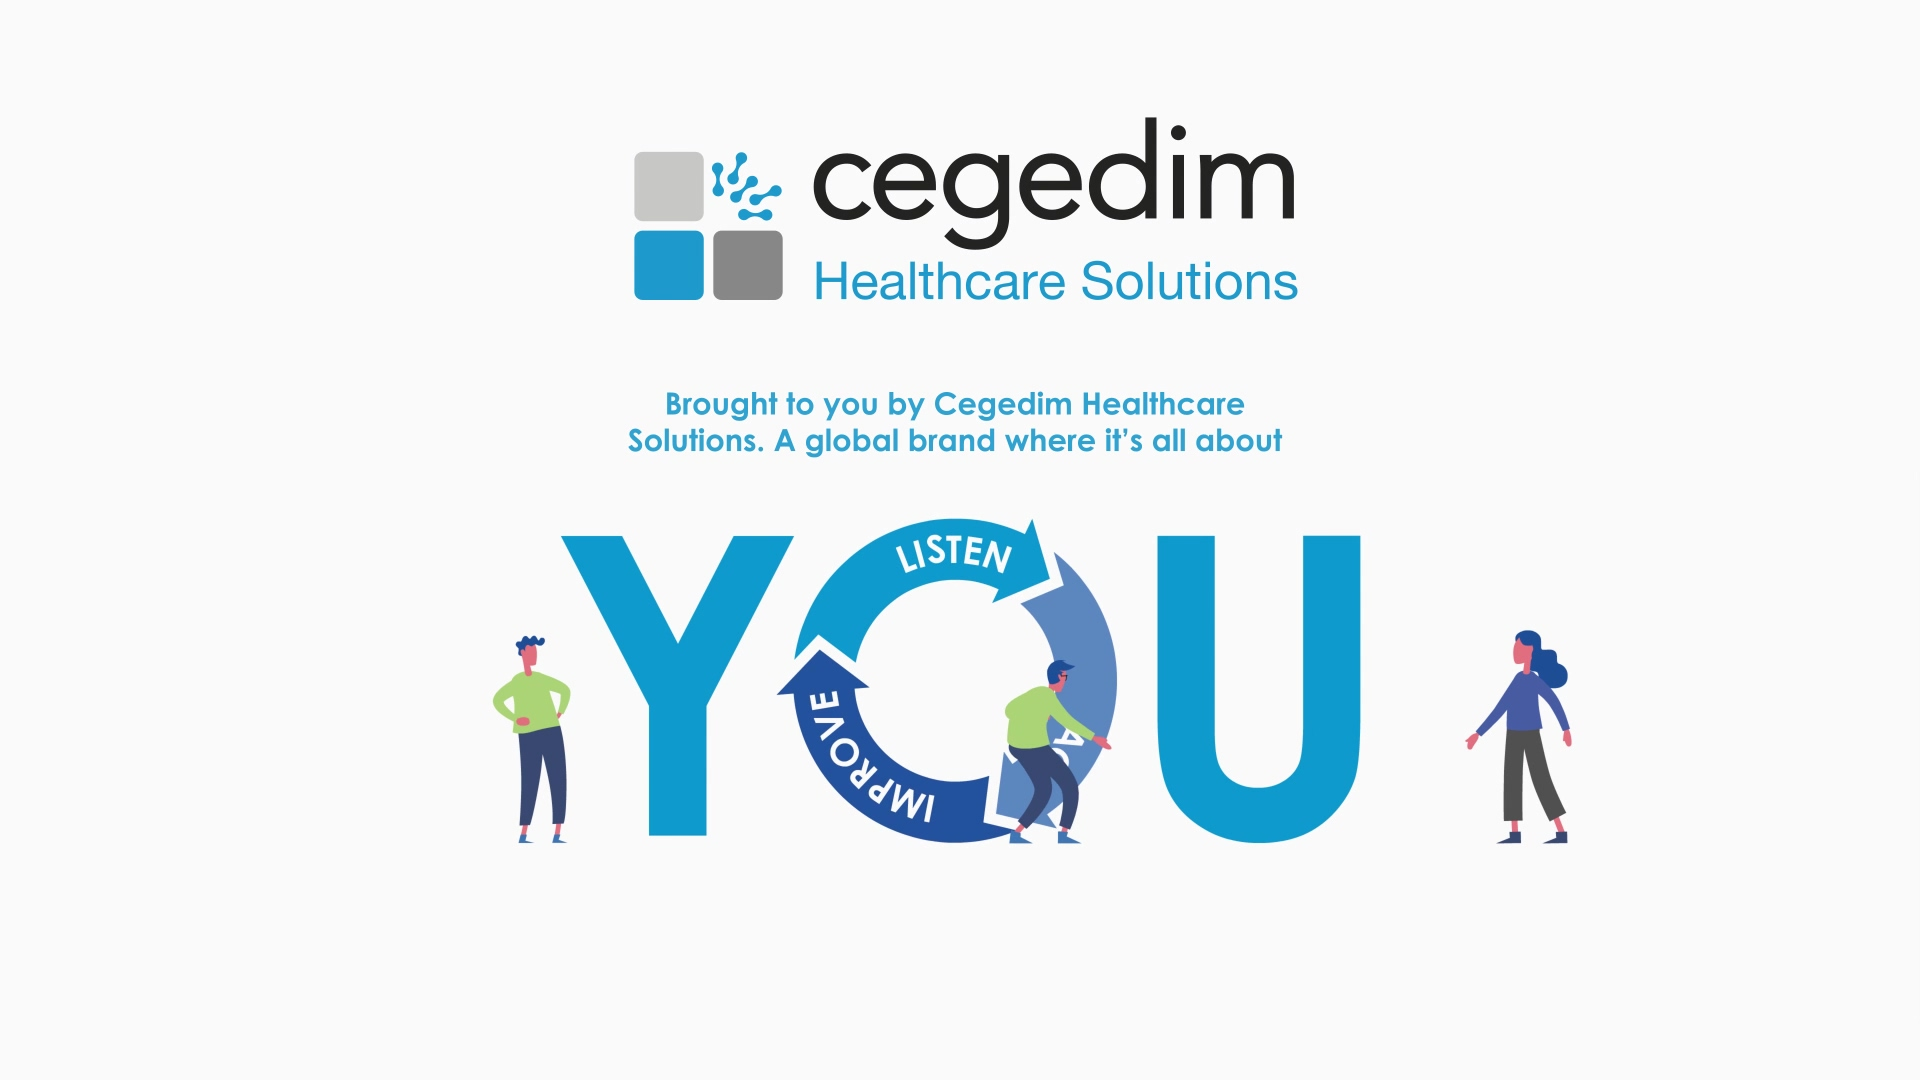 Cegedim_HealthcareSolutions2020_FINAL